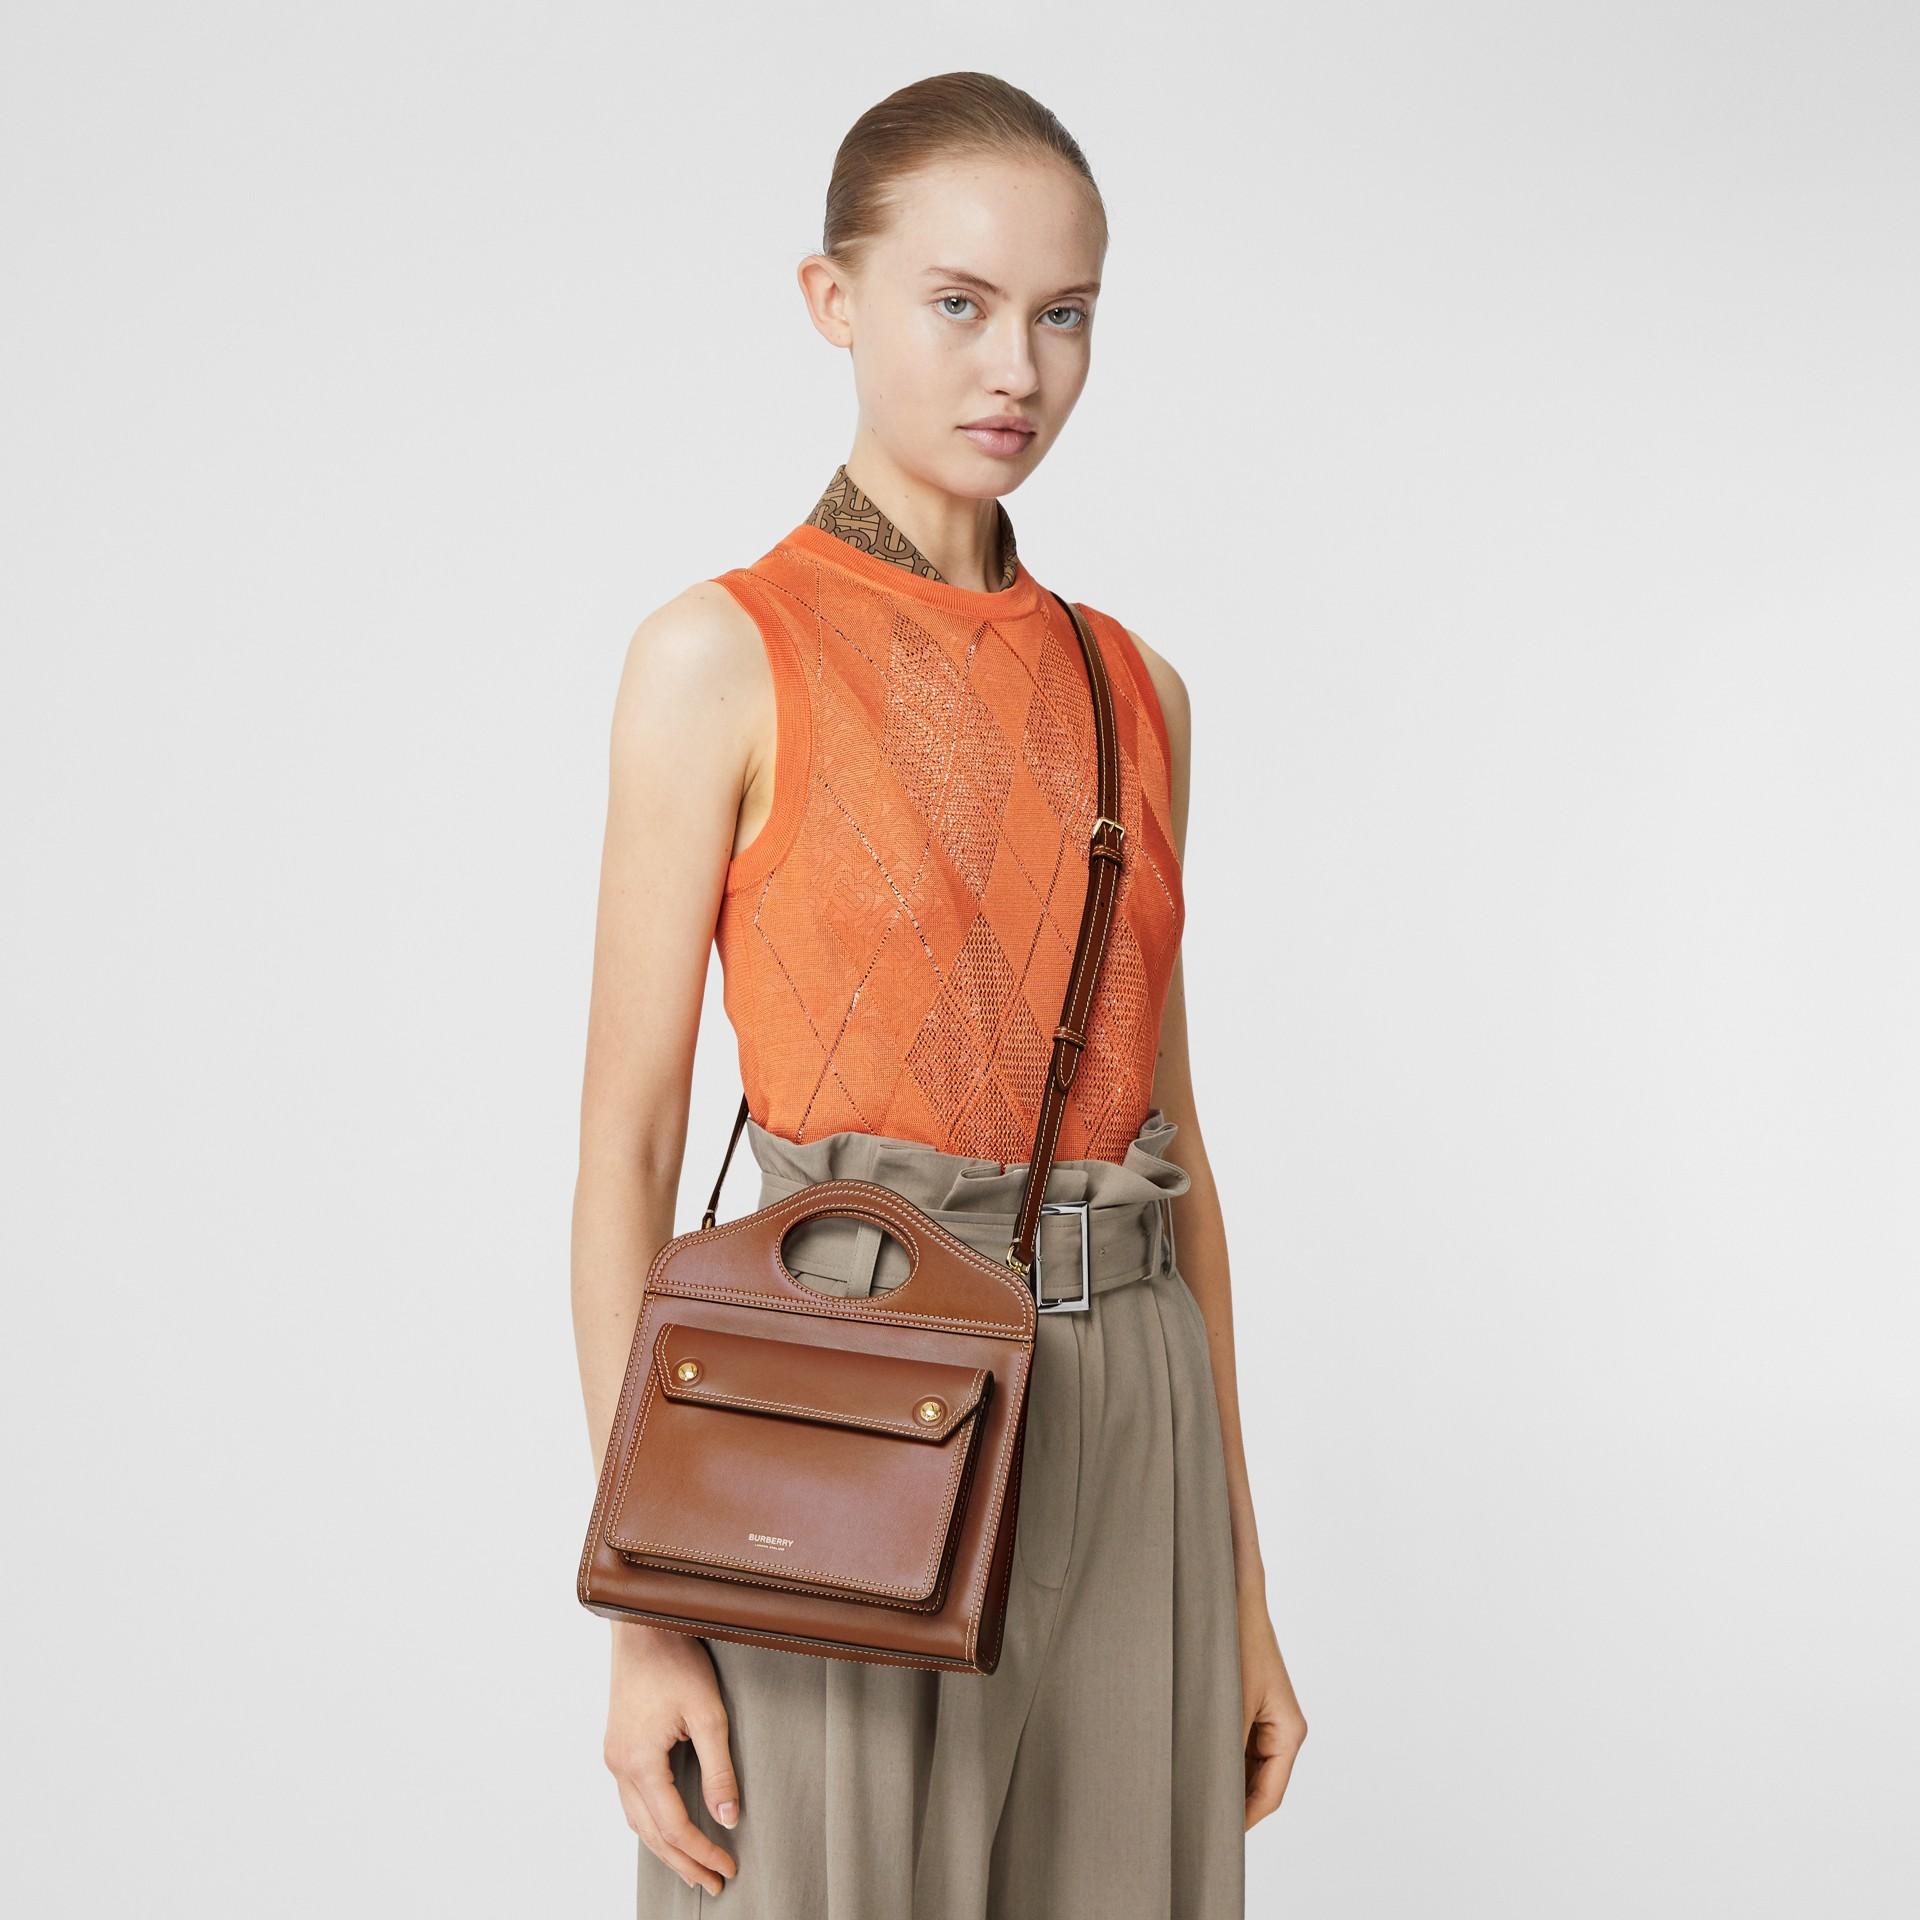 Mini Topstitch Detail Leather Pocket Bag in Malt Brown - Women | Burberry United Kingdom - gallery image 7